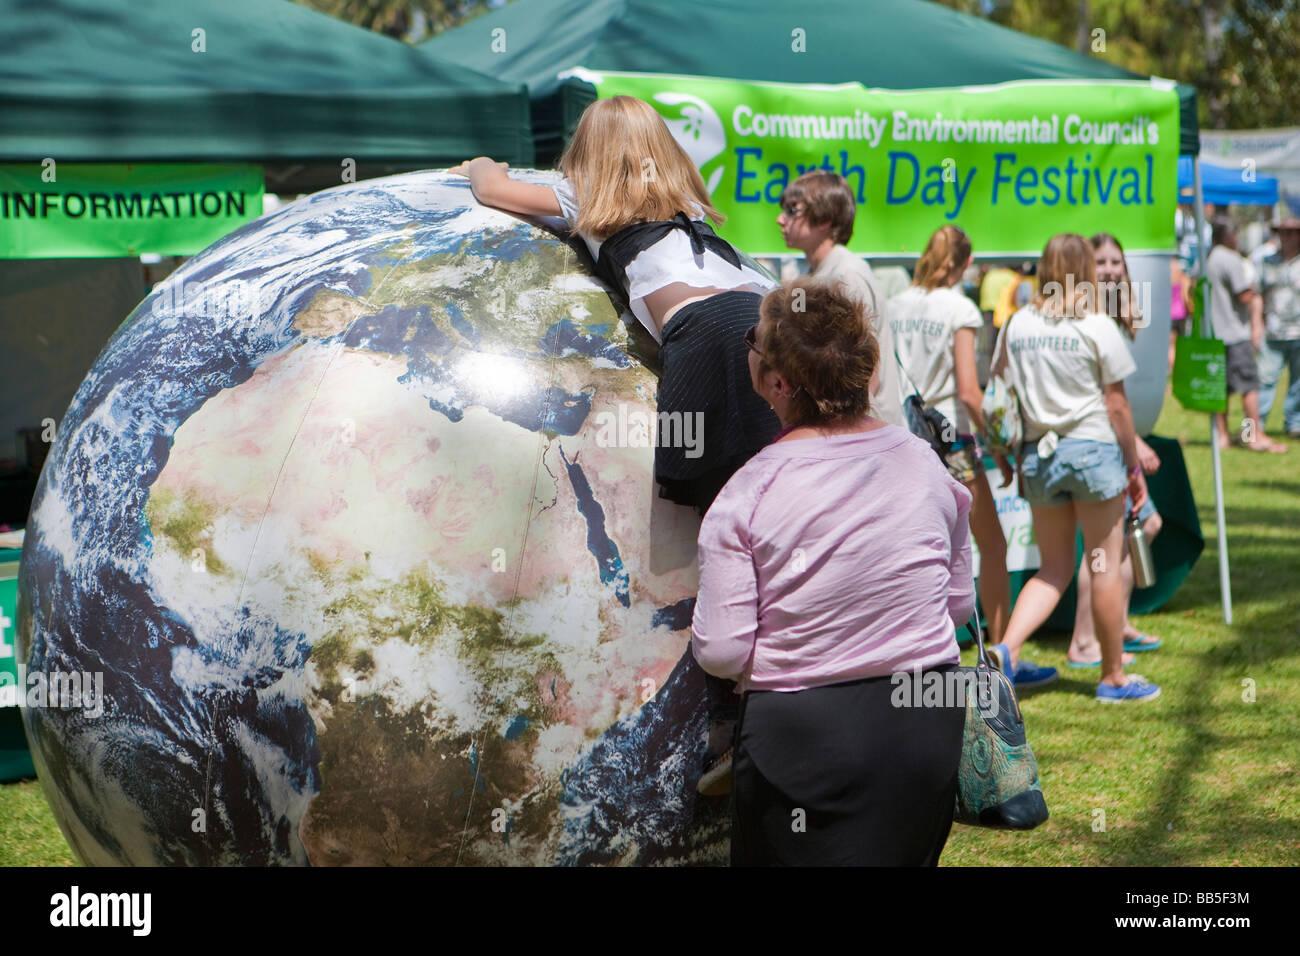 Enfant jouant avec globe gonflé le jour de la Terre fête Santa Barbara California United States of America Photo Stock